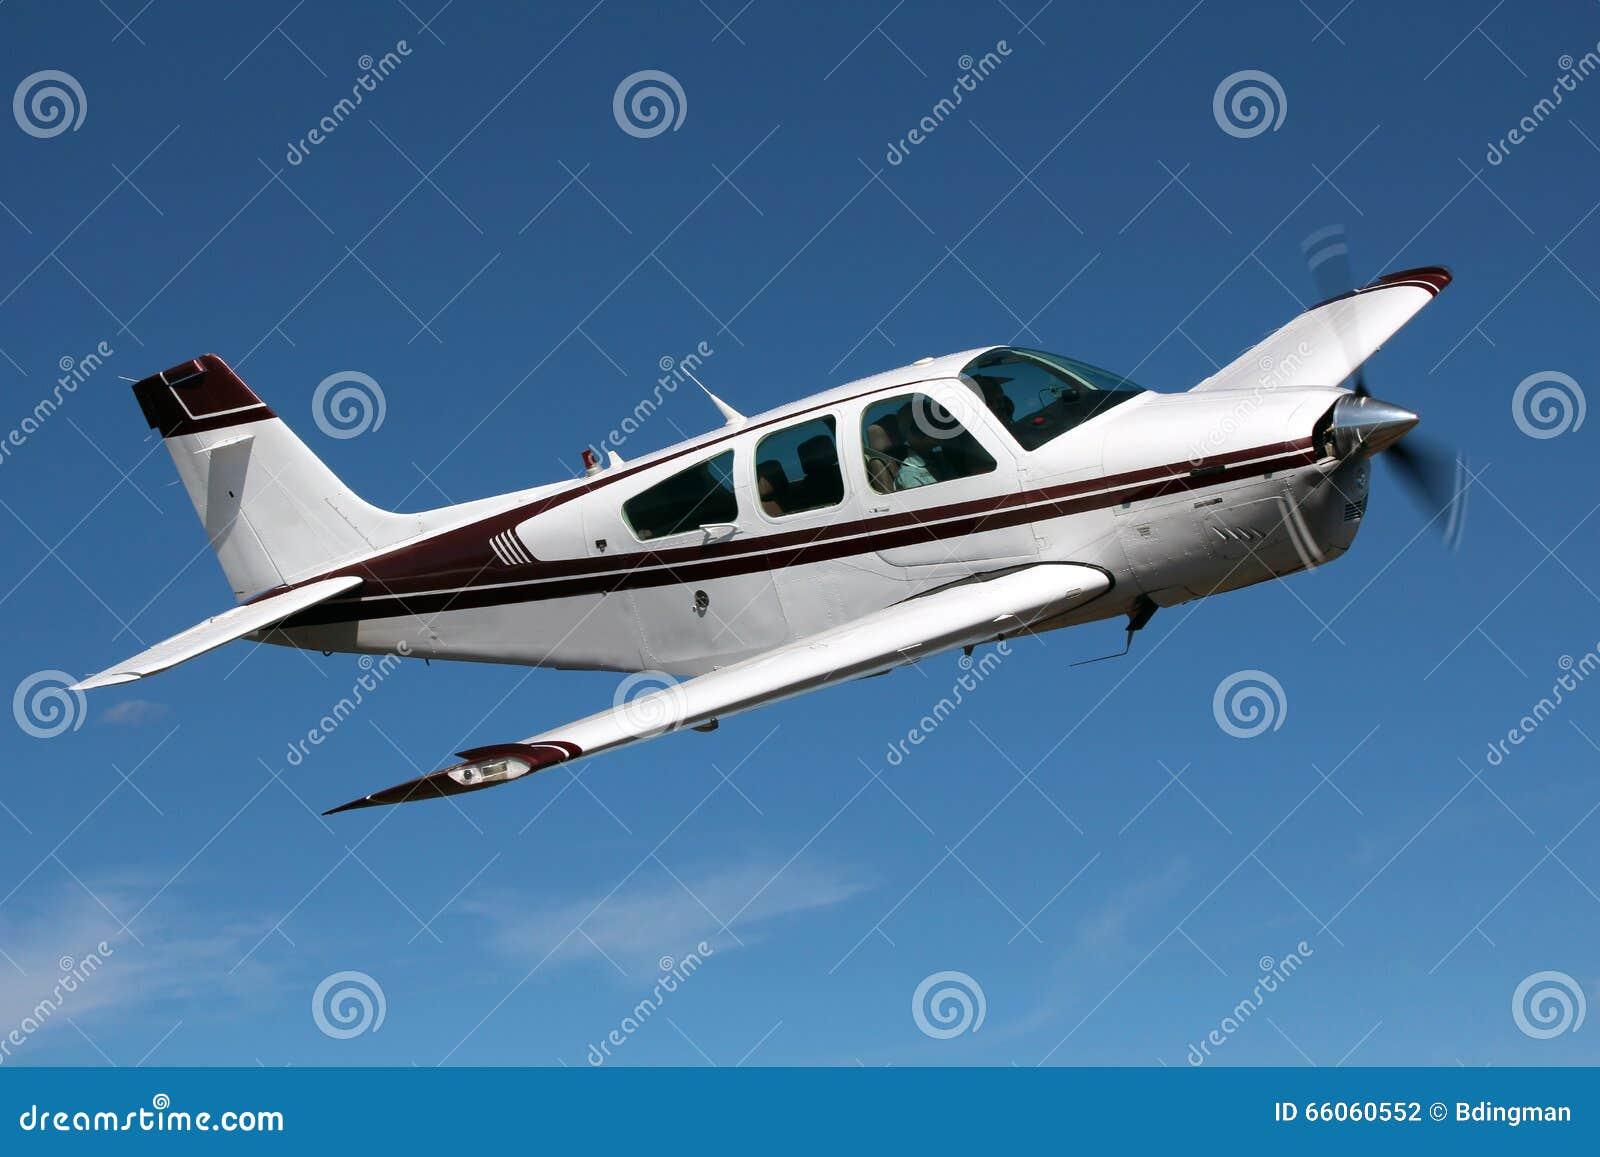 General Aviation - Beechcraft Bonanza Editorial Photography - Image